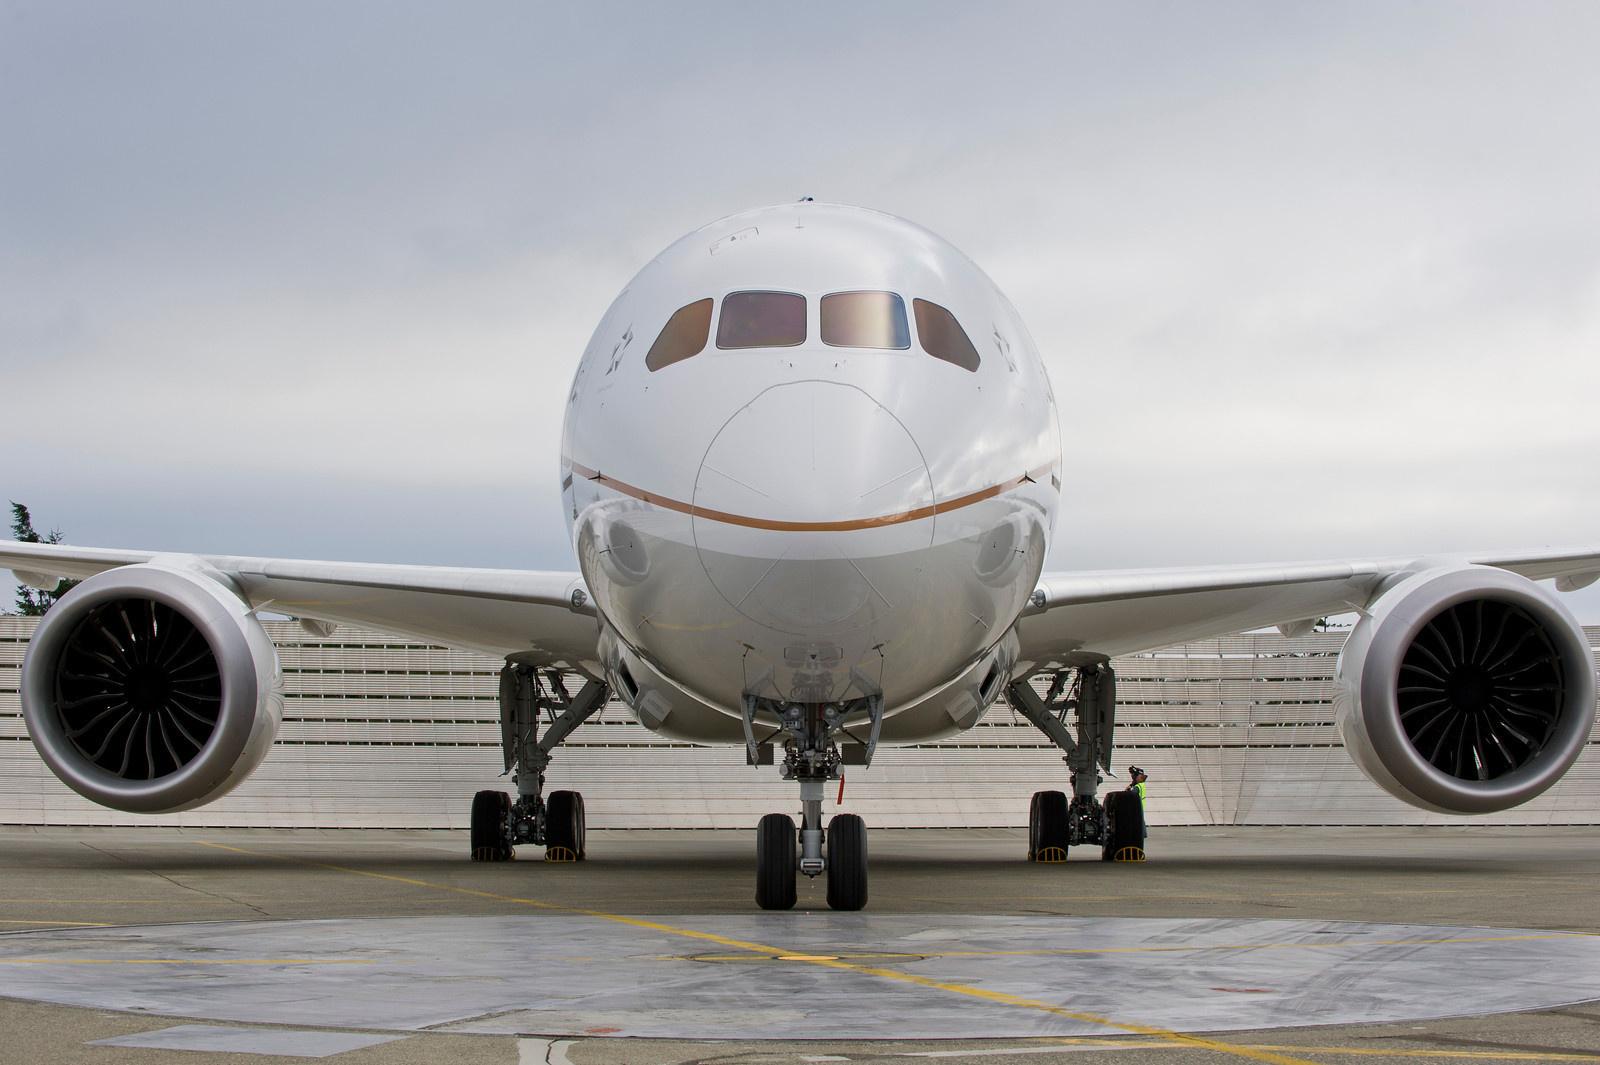 U.S. Airlines Reach Coronavirus Aid Agreements